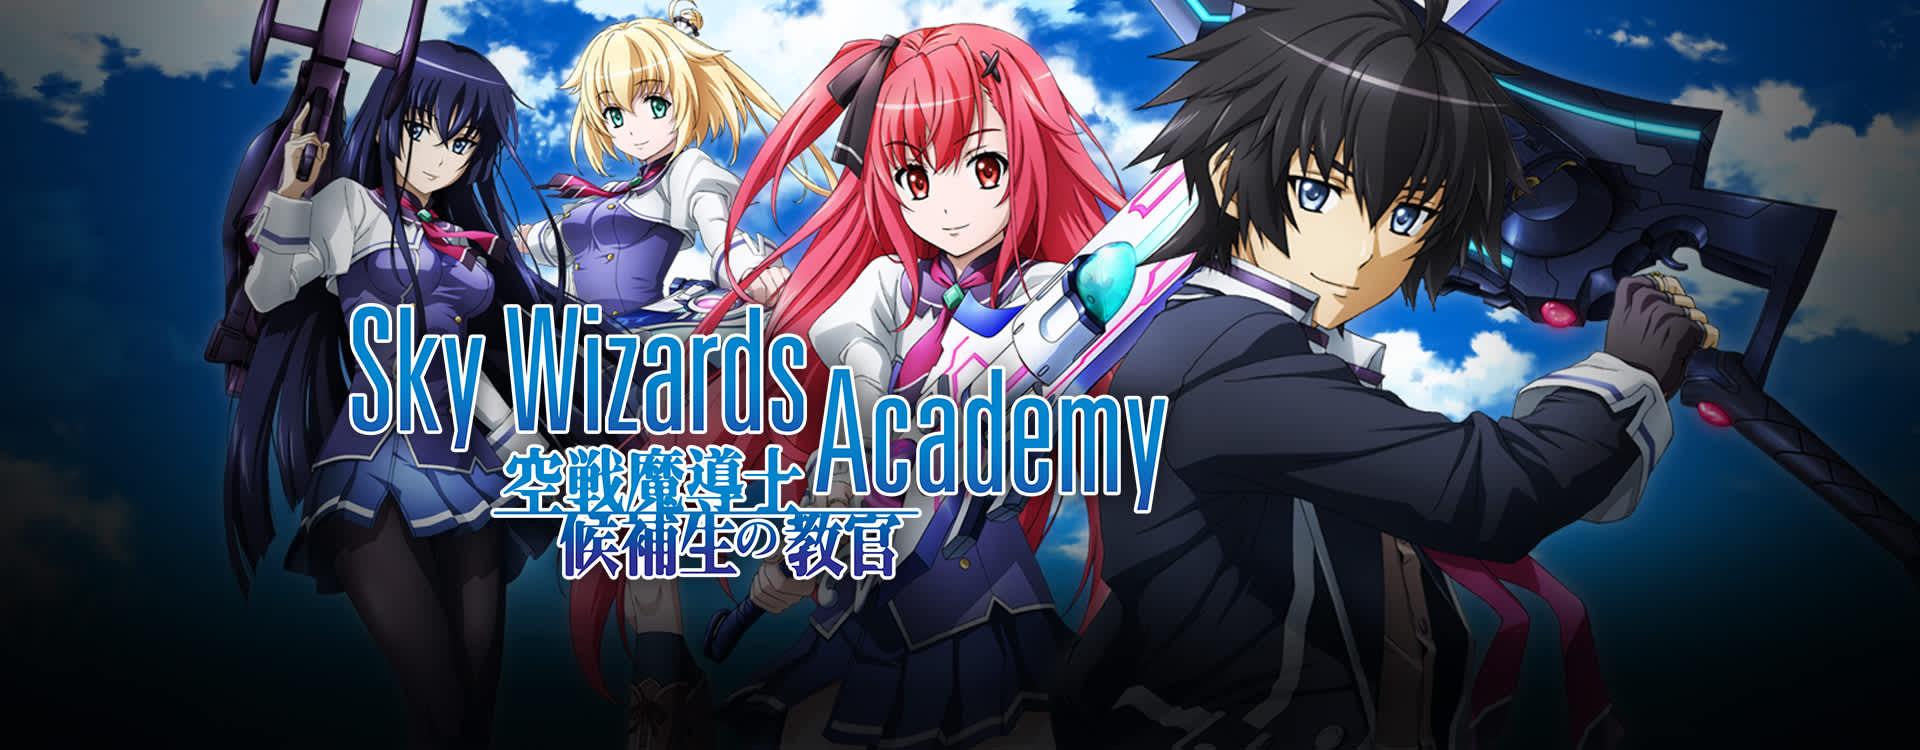 sky wizard academy bs